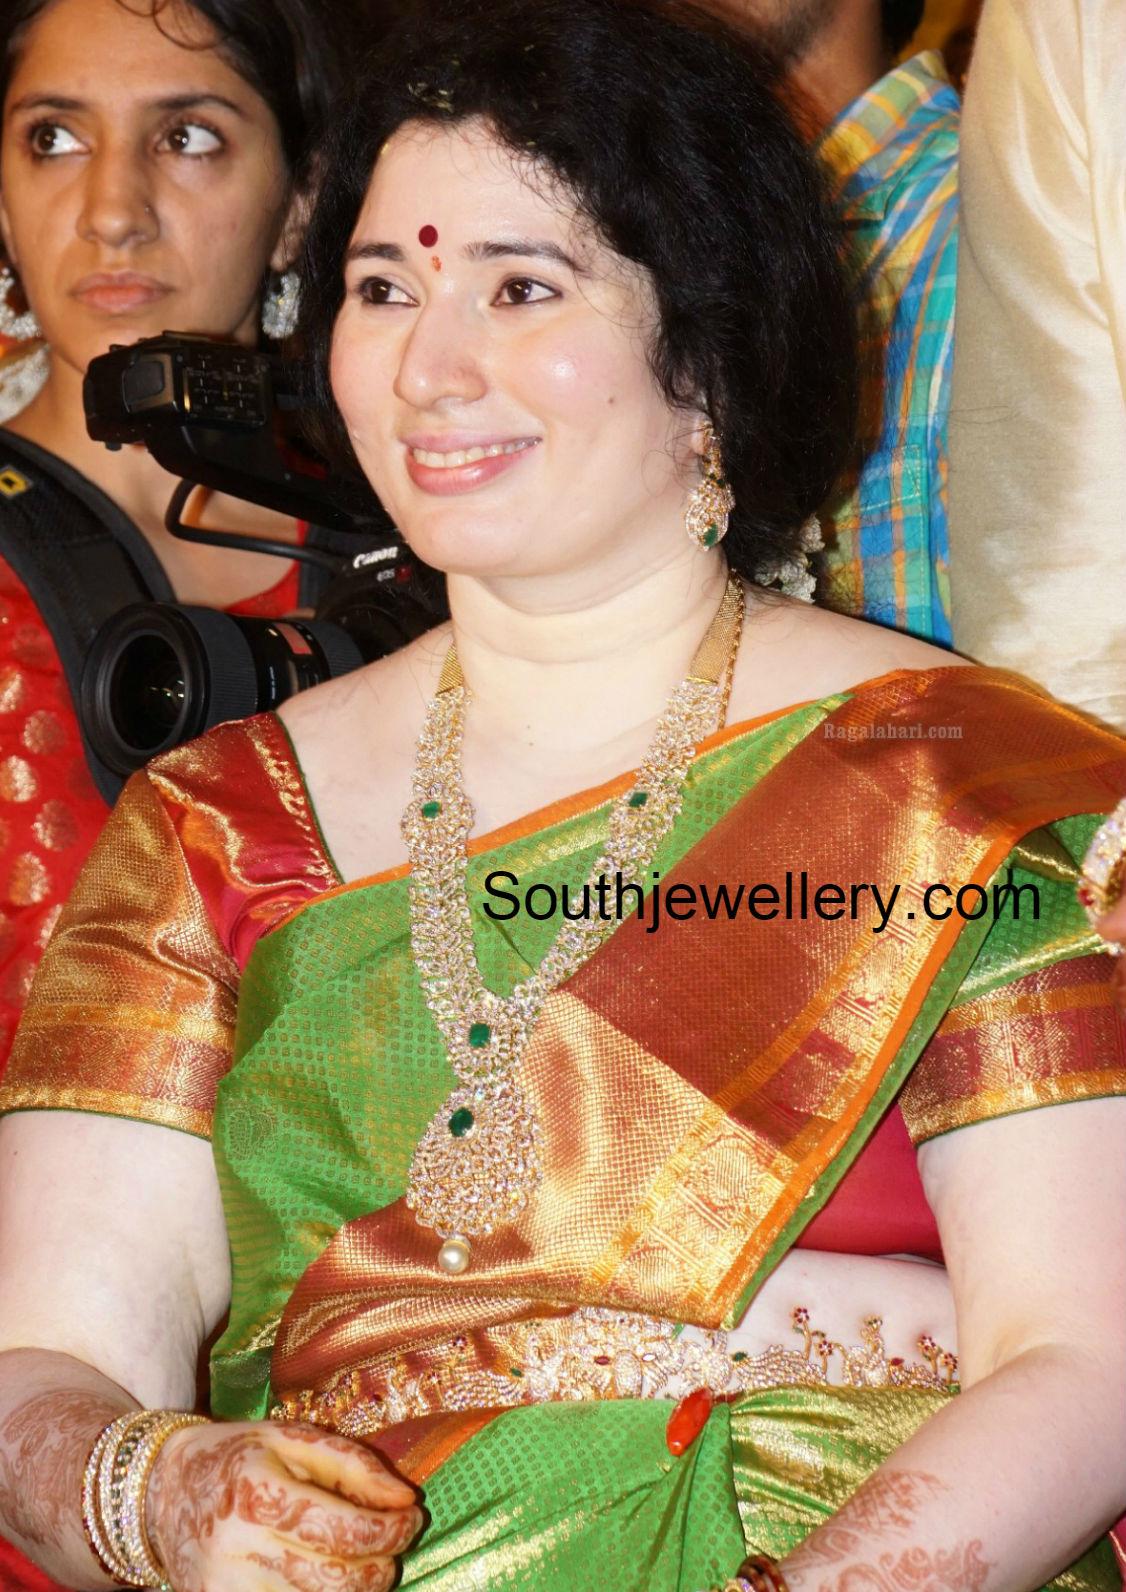 Suhasini in gundla haram jewellery designs - Danam Nagender Wife In Diamond Jewelry